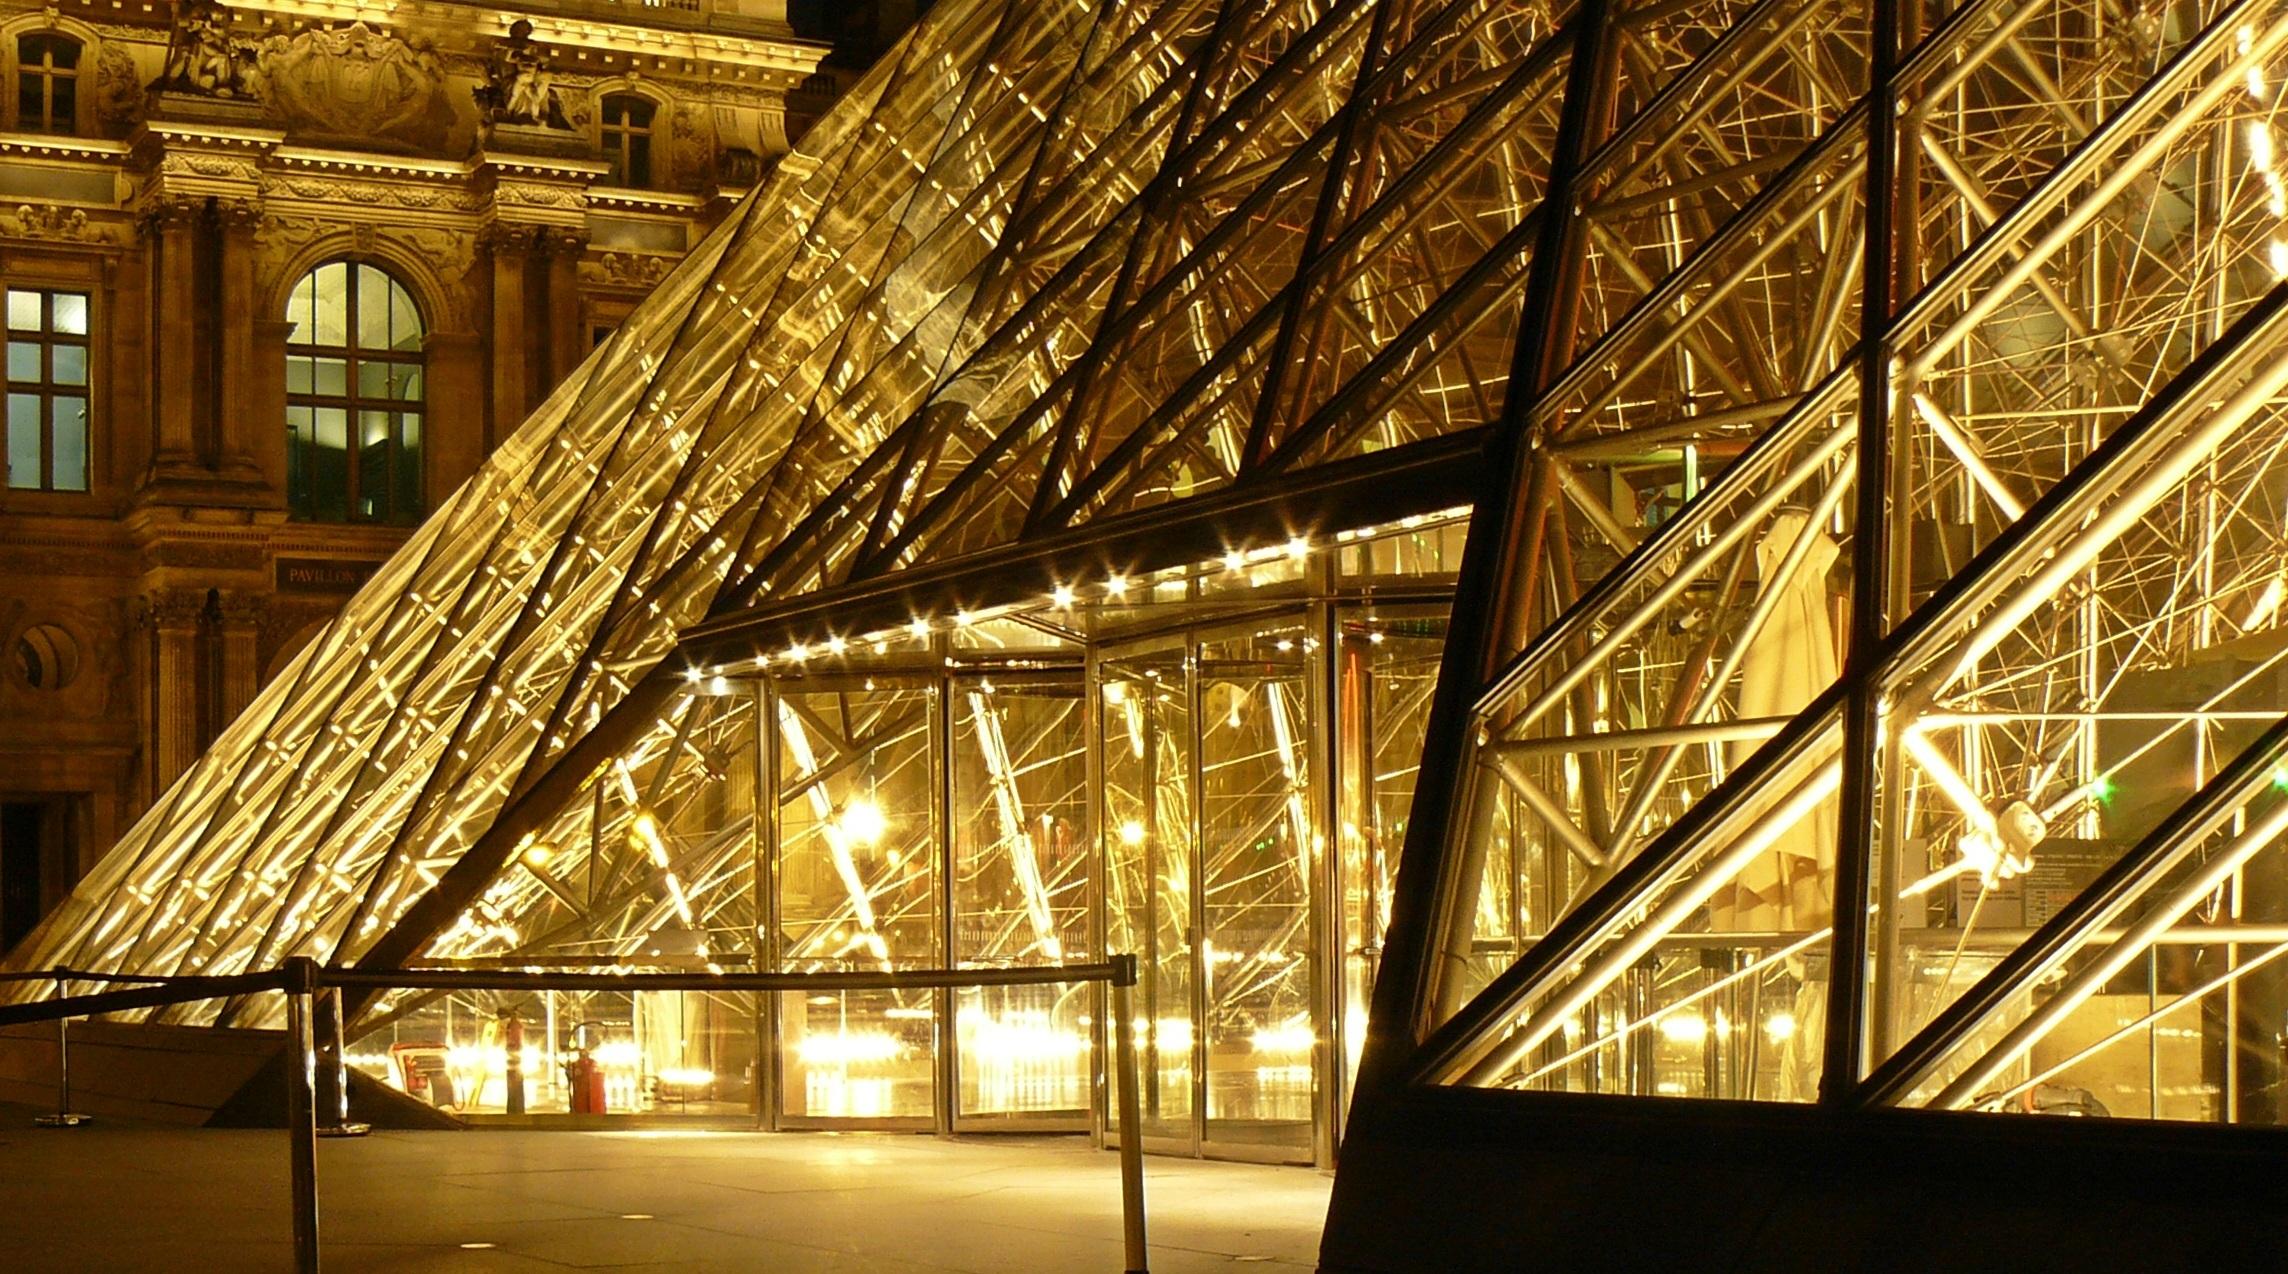 Eiffel Tower Scenery Free Stock